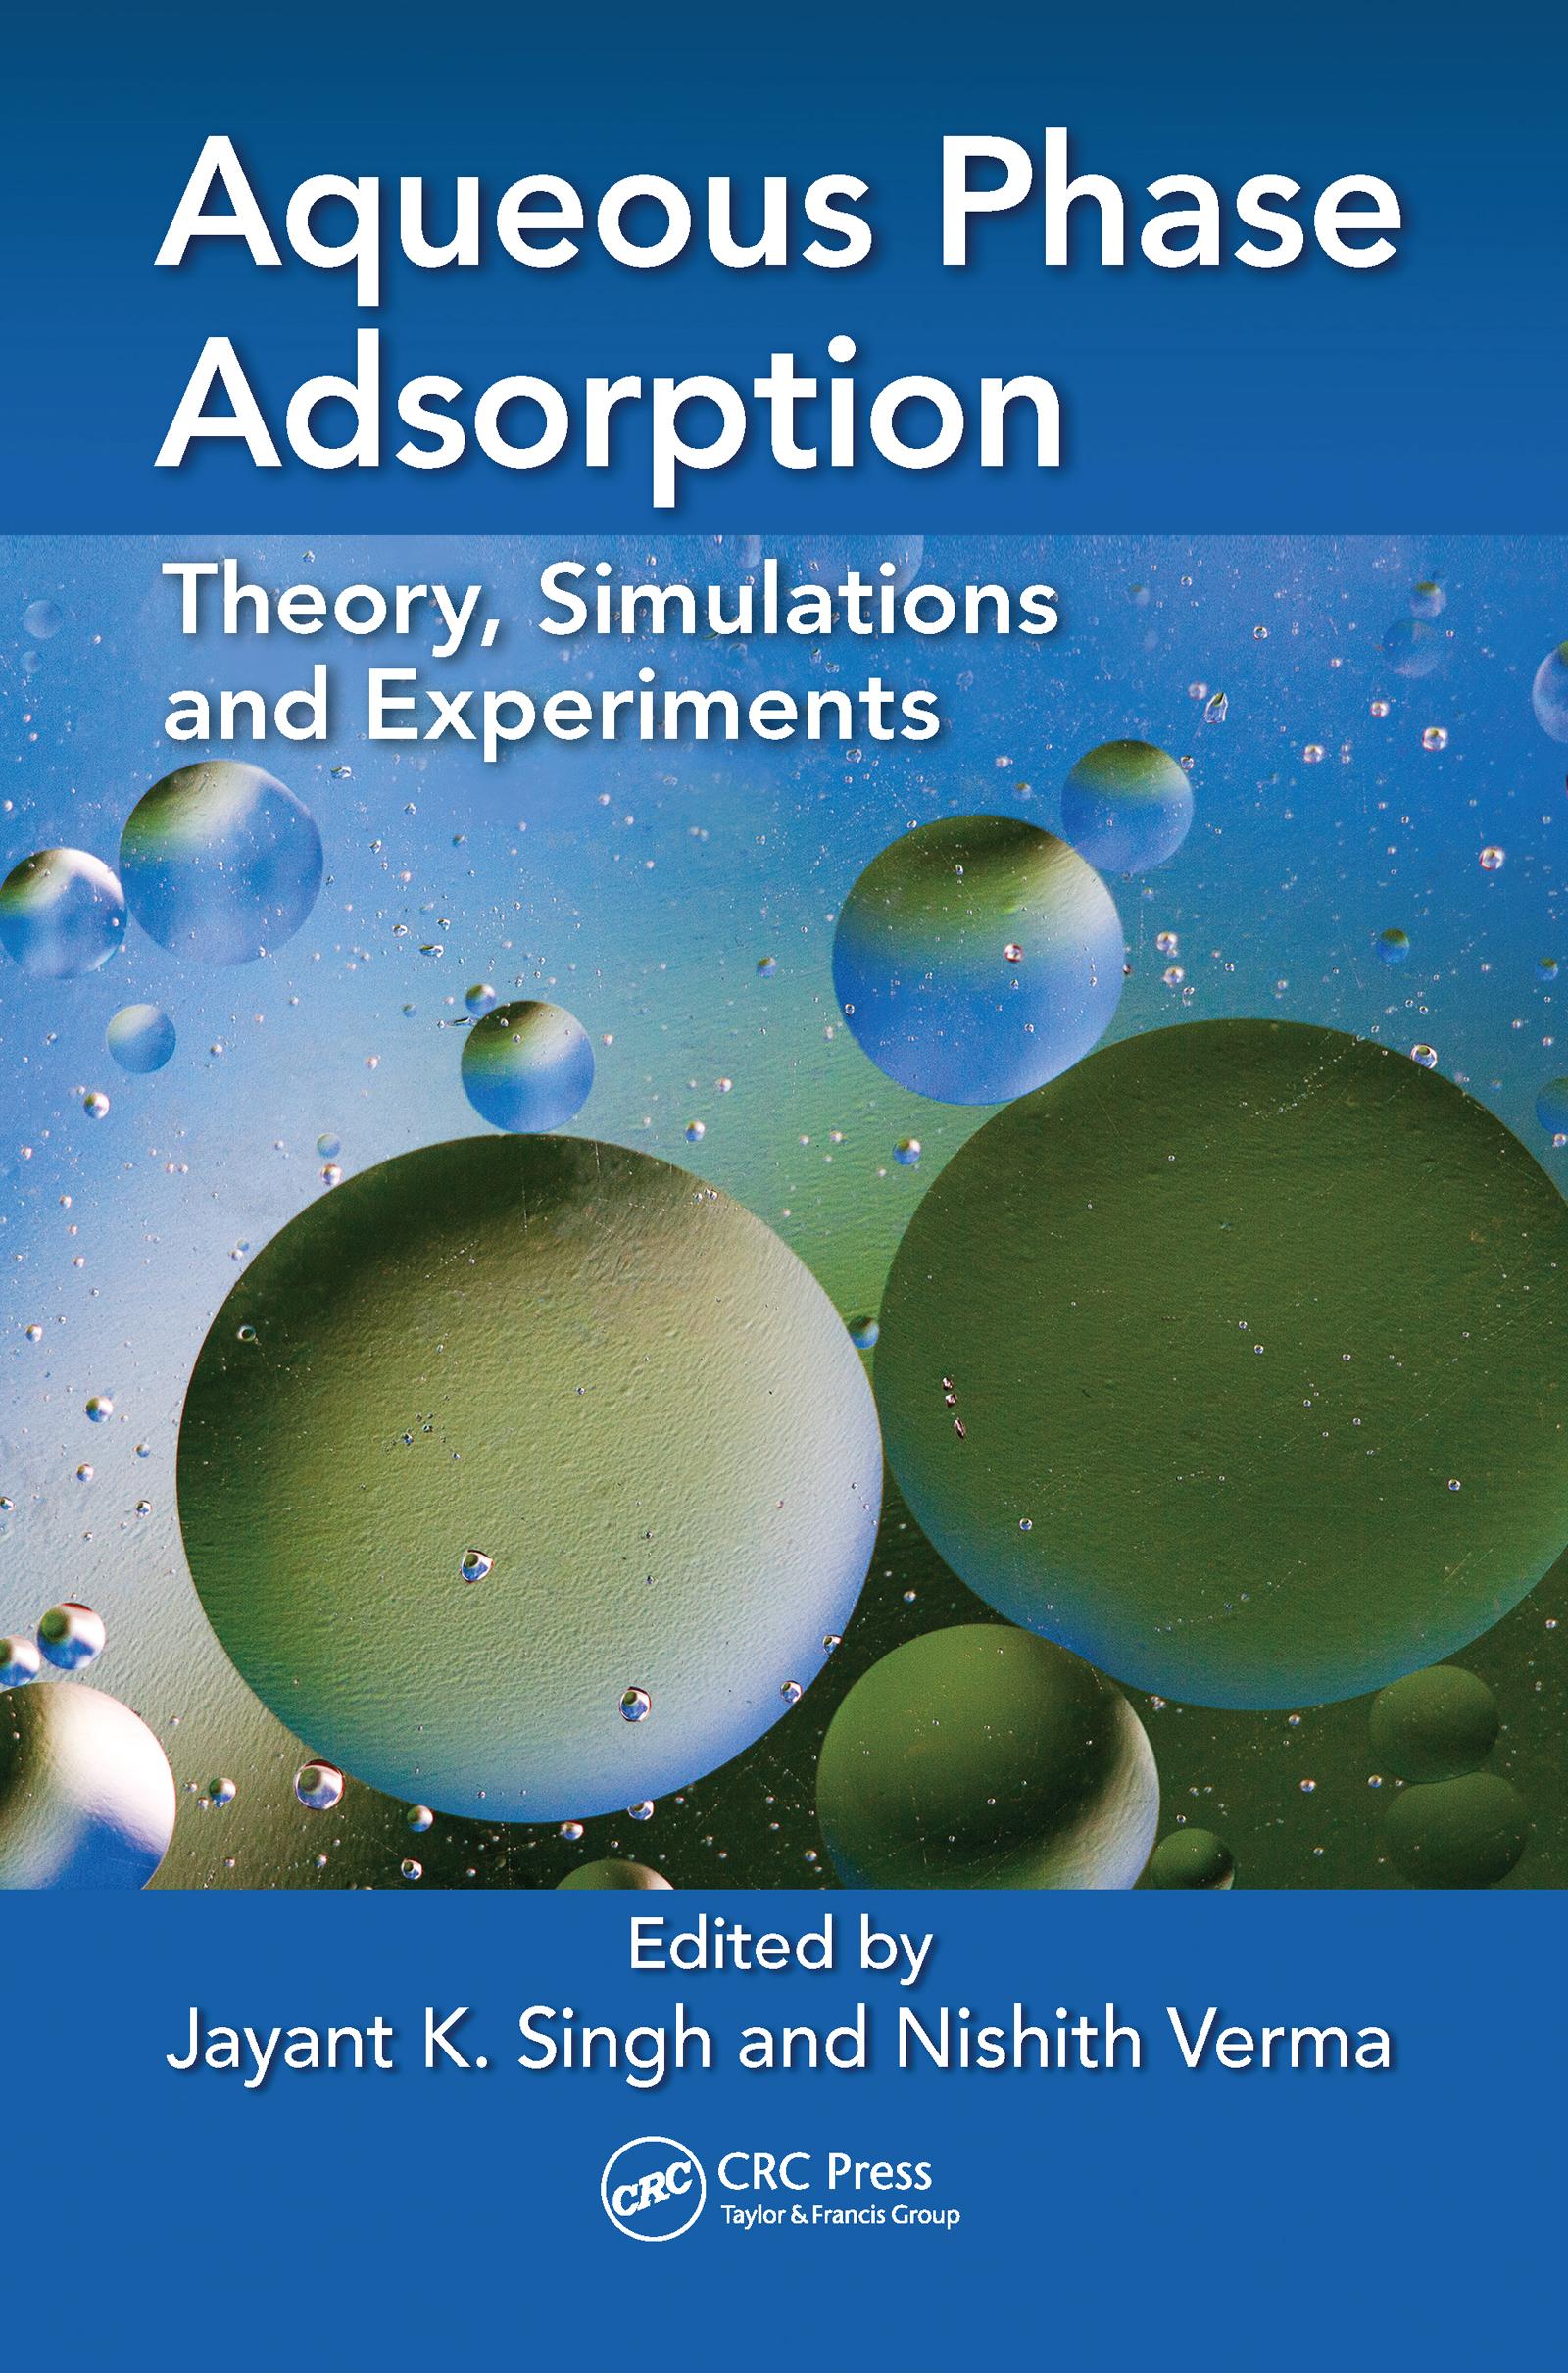 Aqueous Phase Adsorption